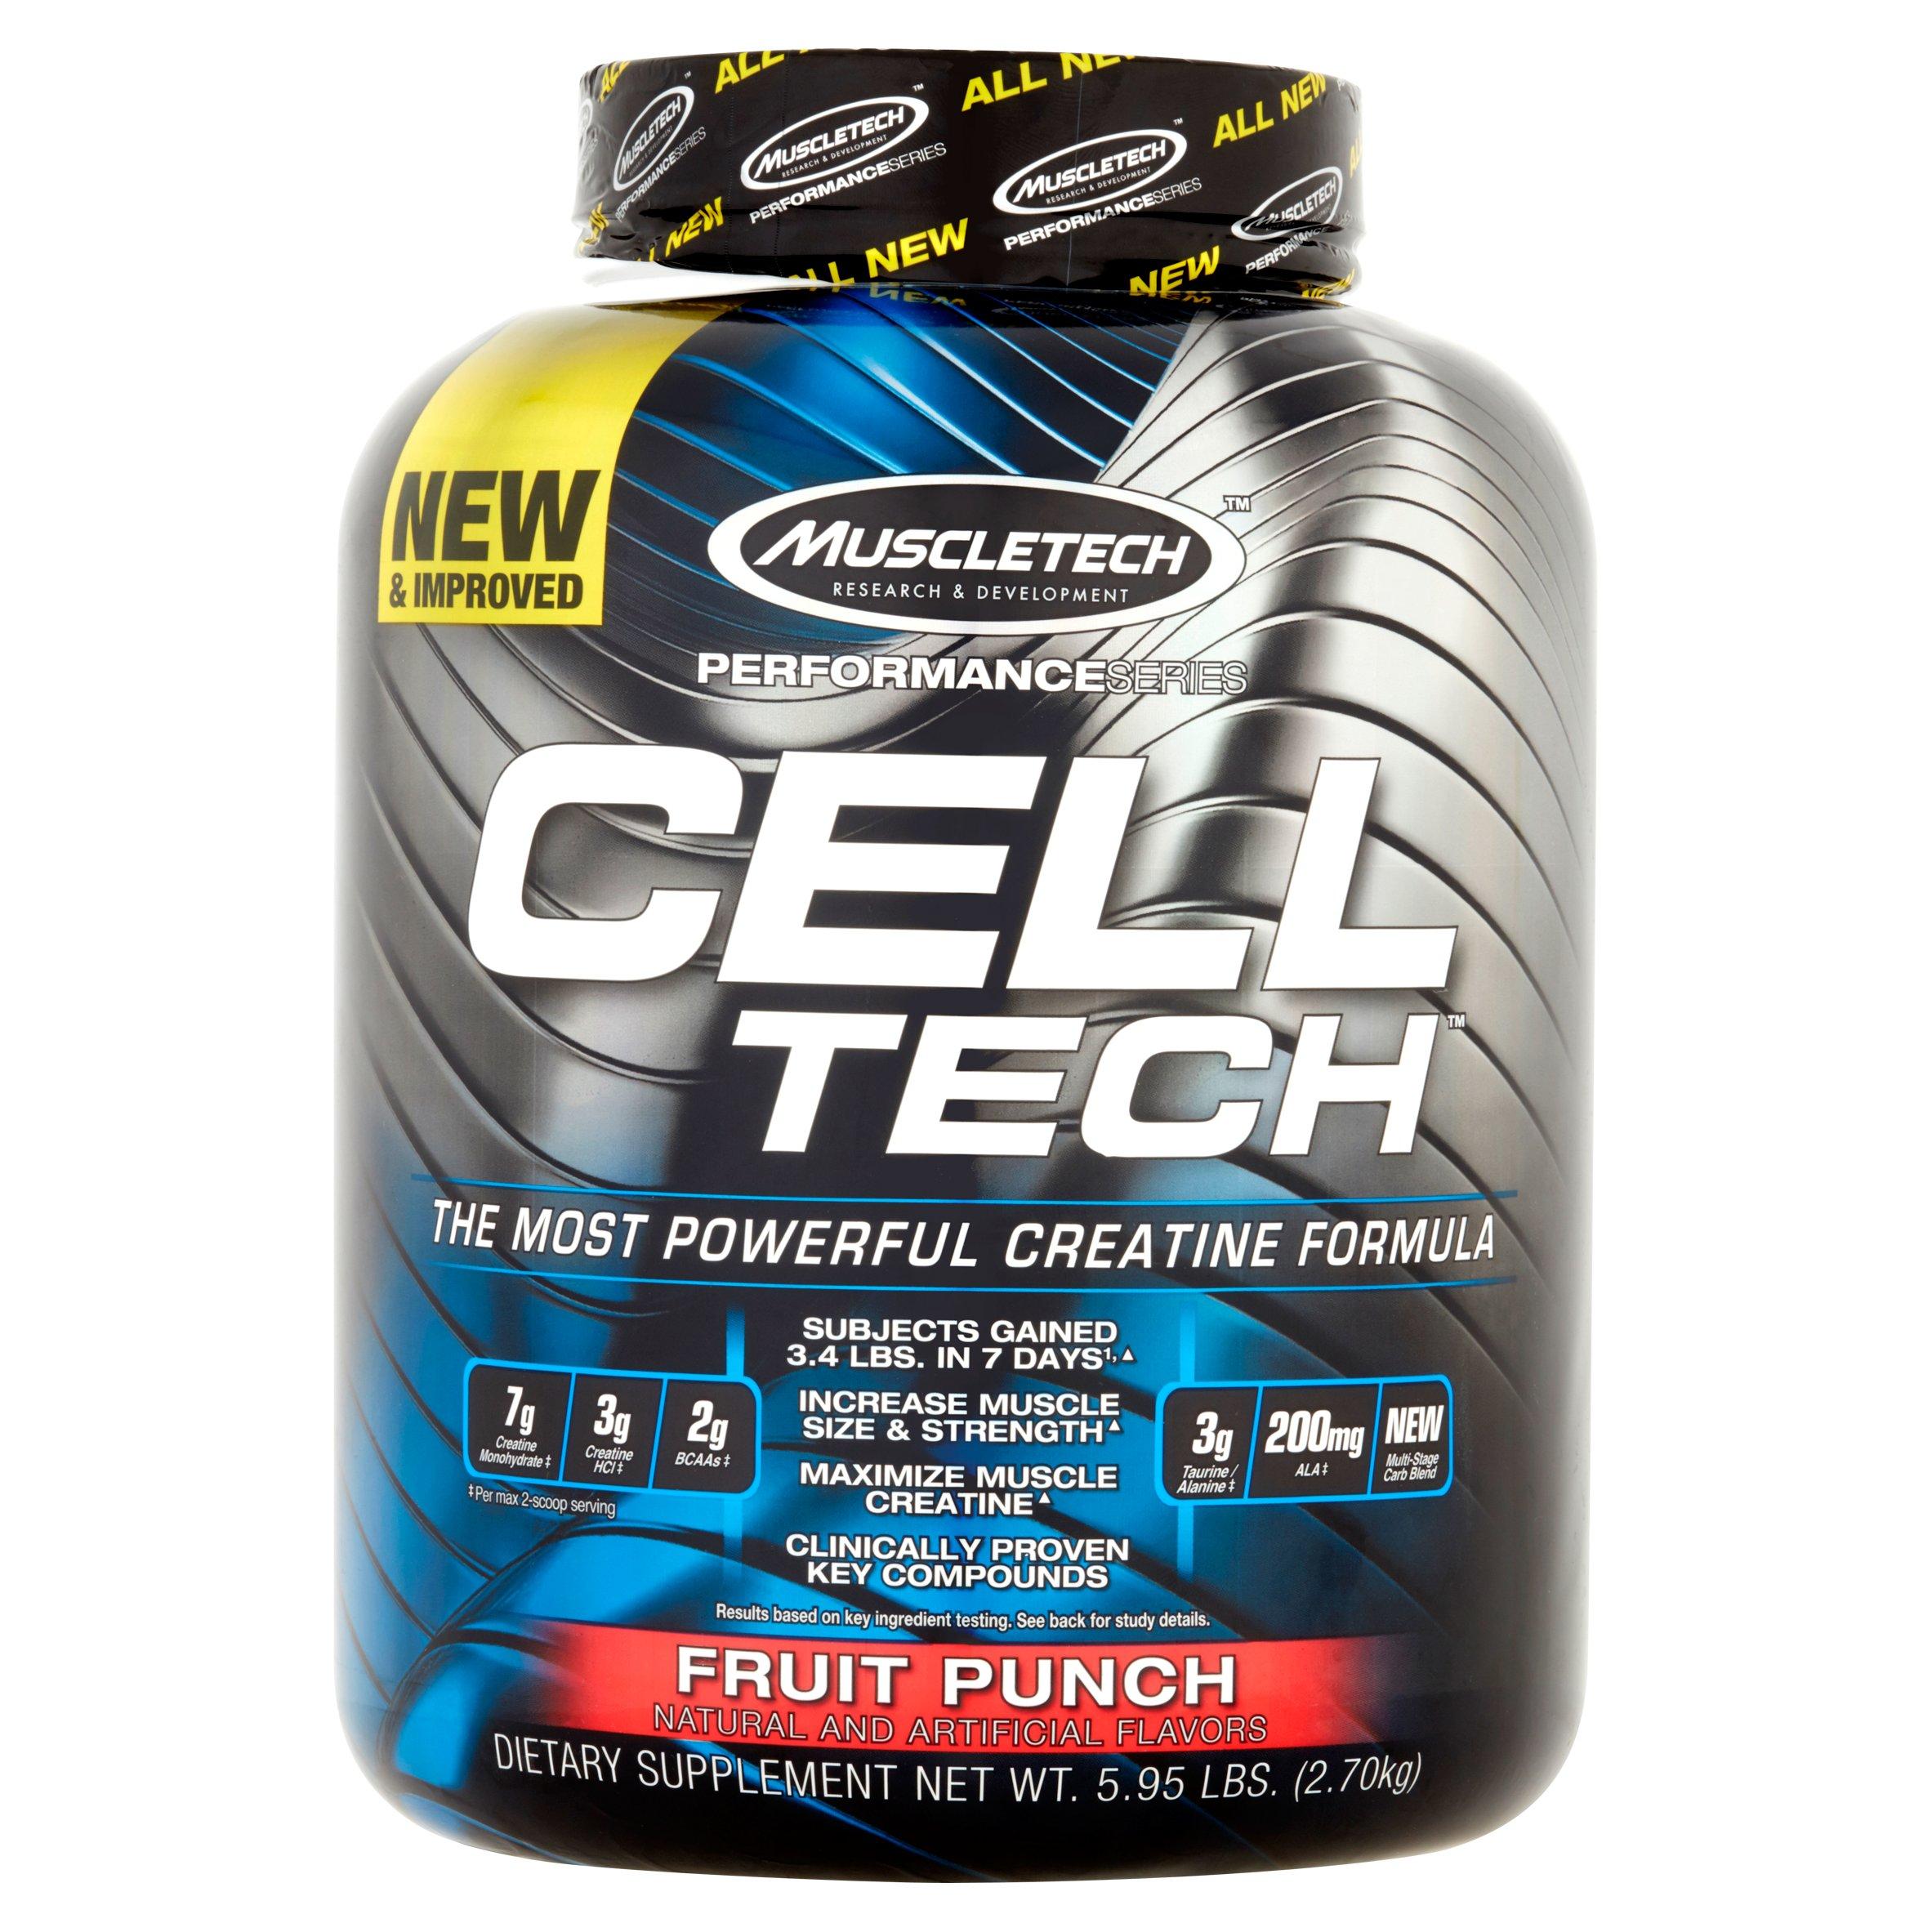 MuscleTech Cell Tech Creatine Powder, Fruit Punch, 55 Servings